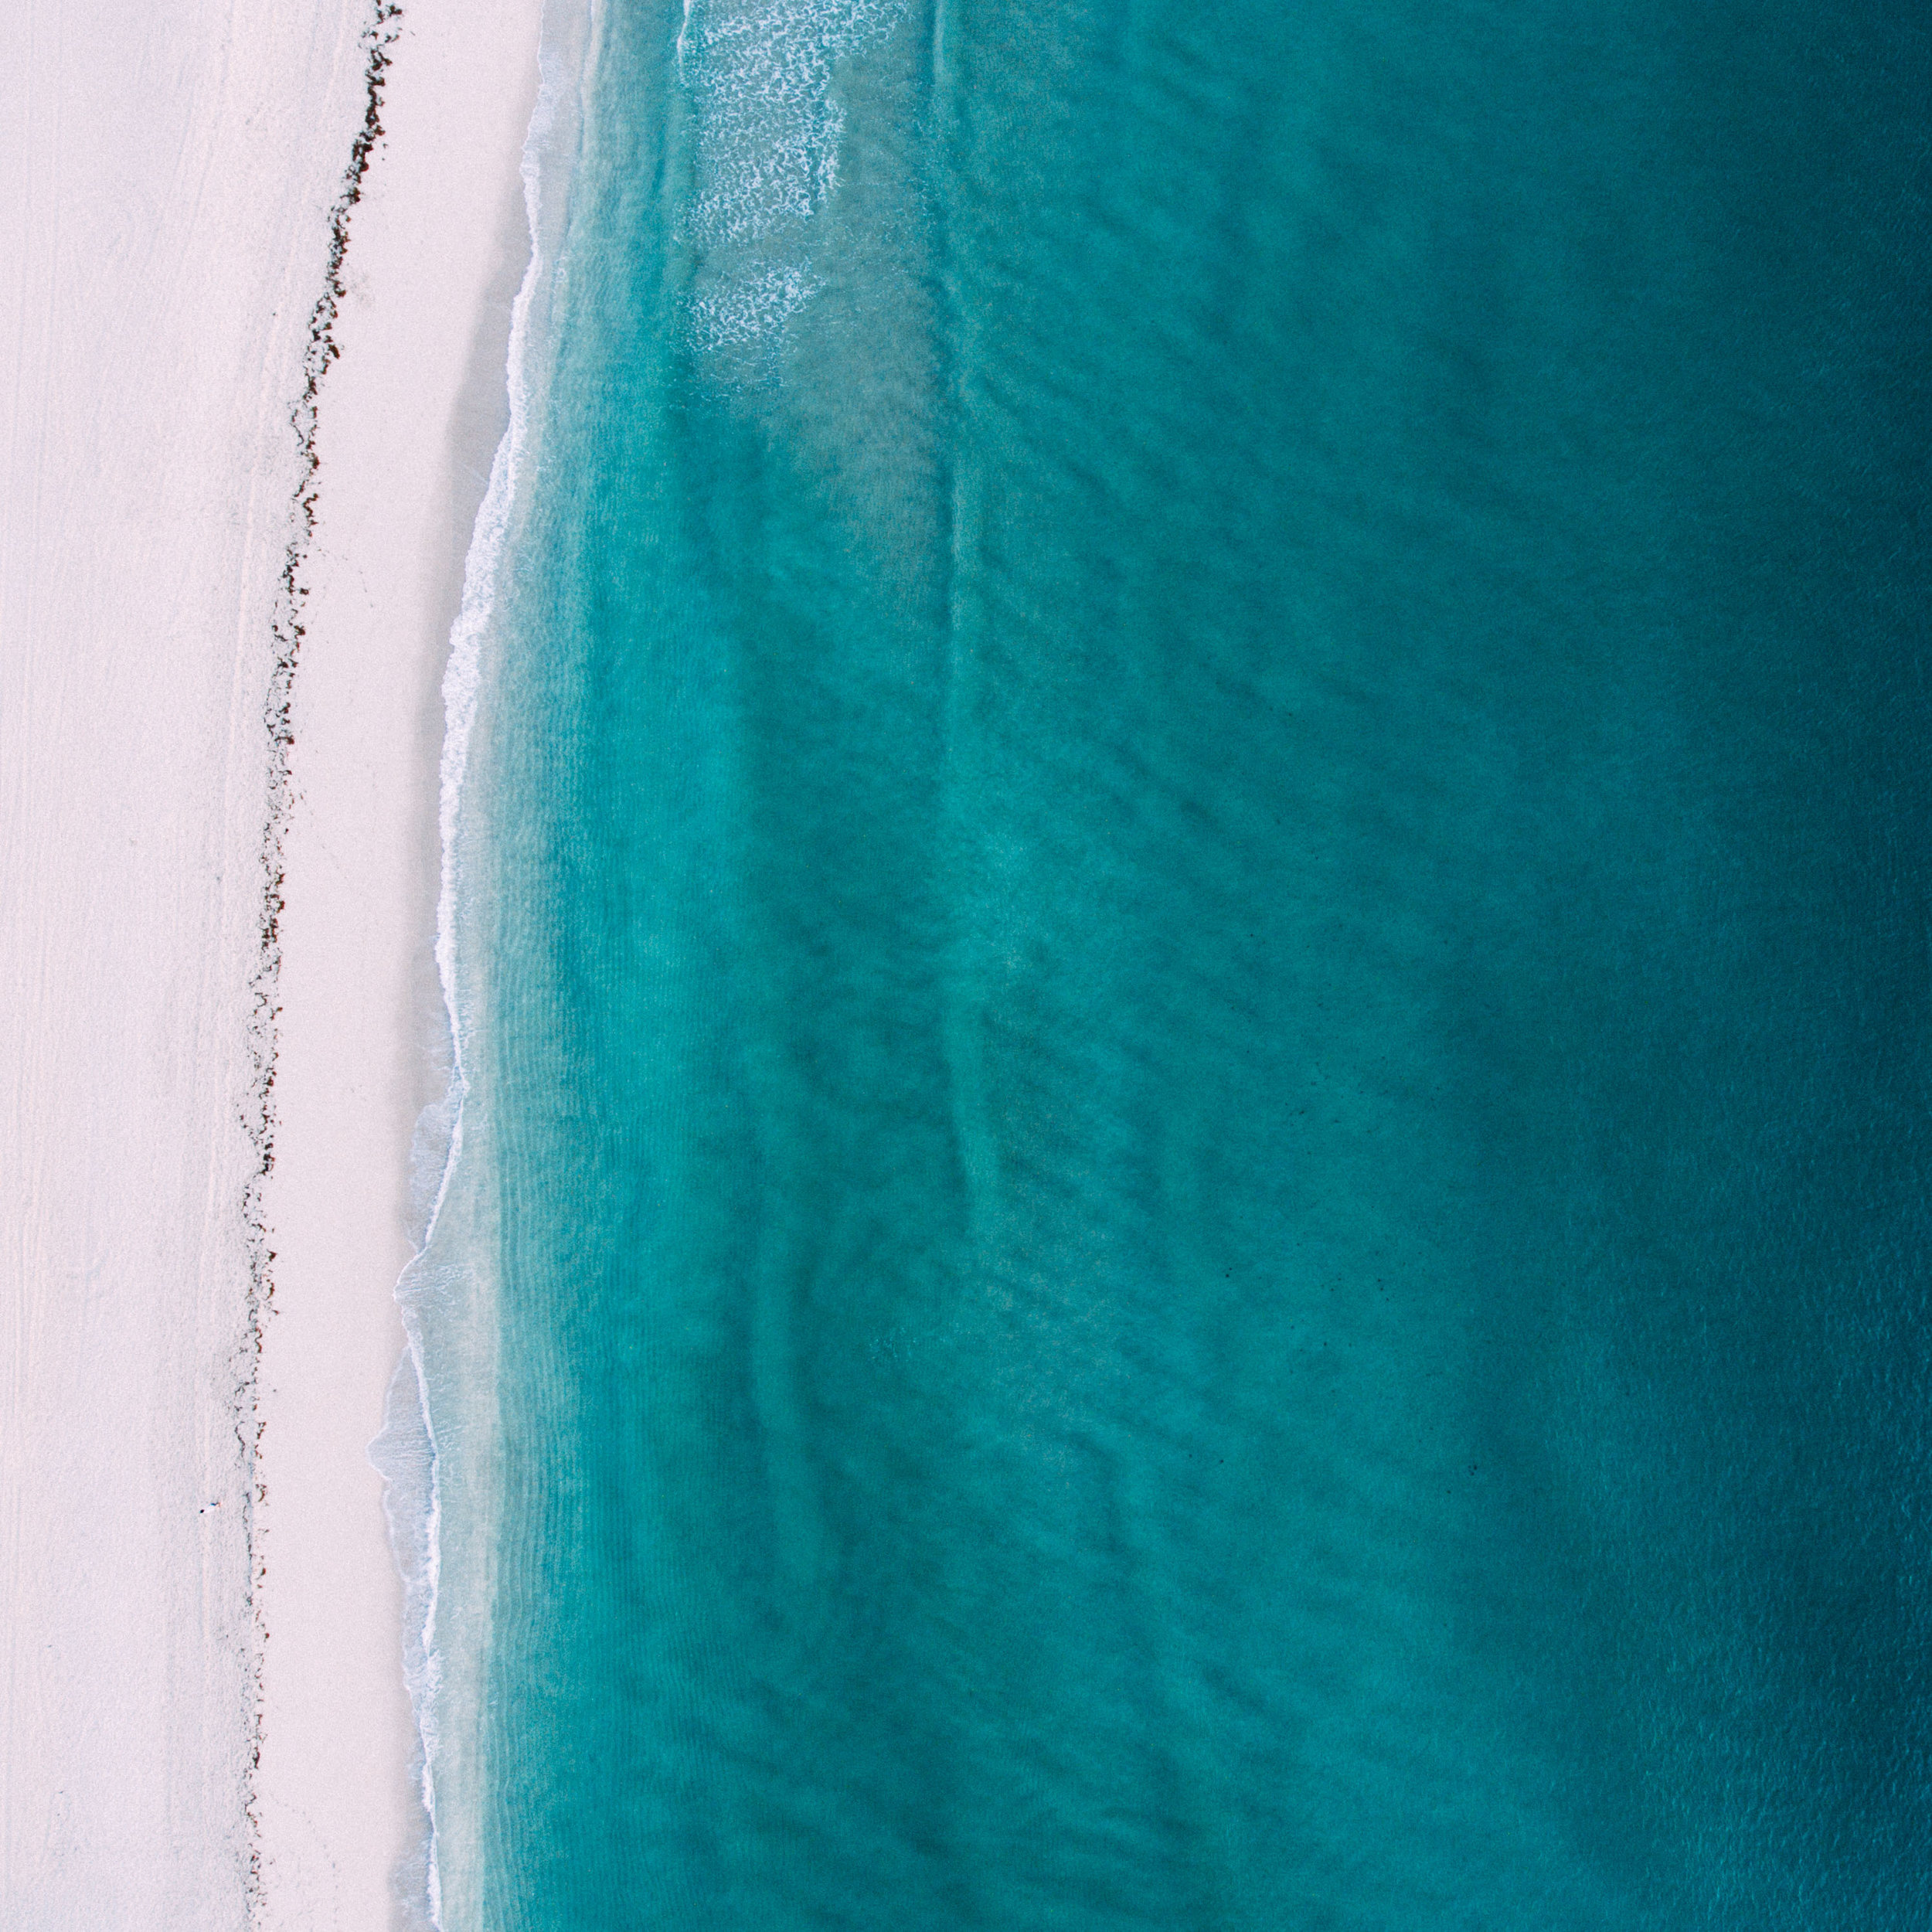 SOUTH FLORIDA -